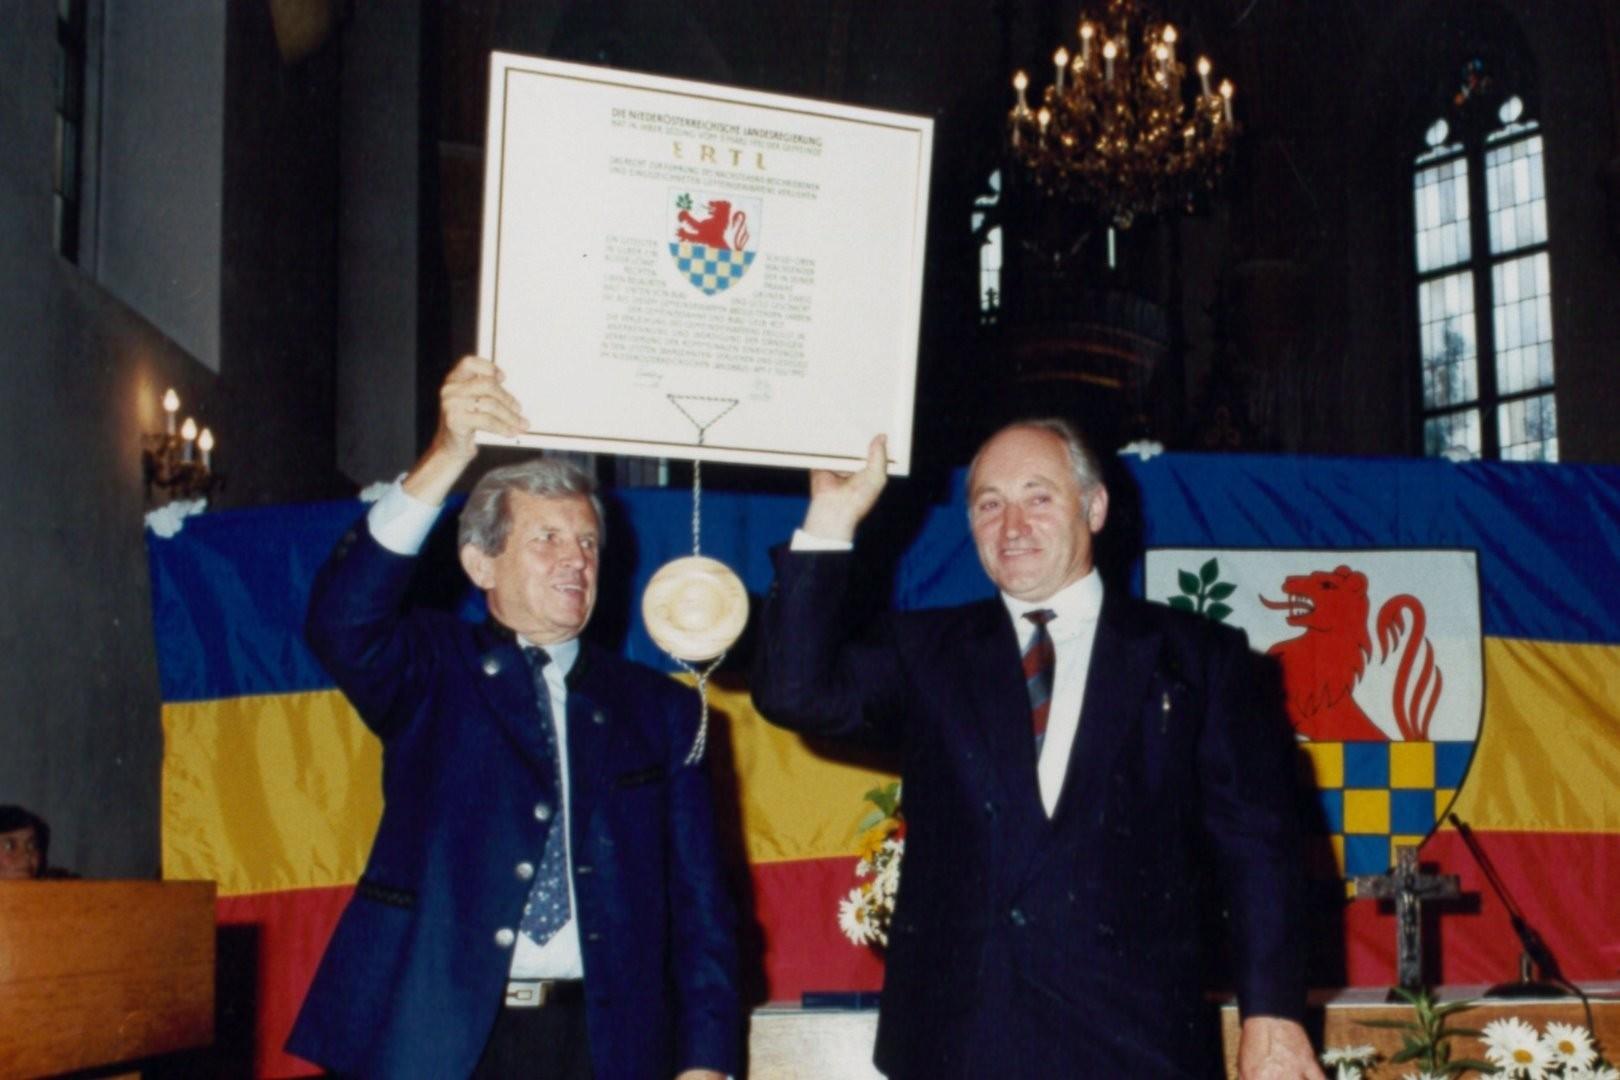 Wappenverleihung 1992 LH BGM.jpg